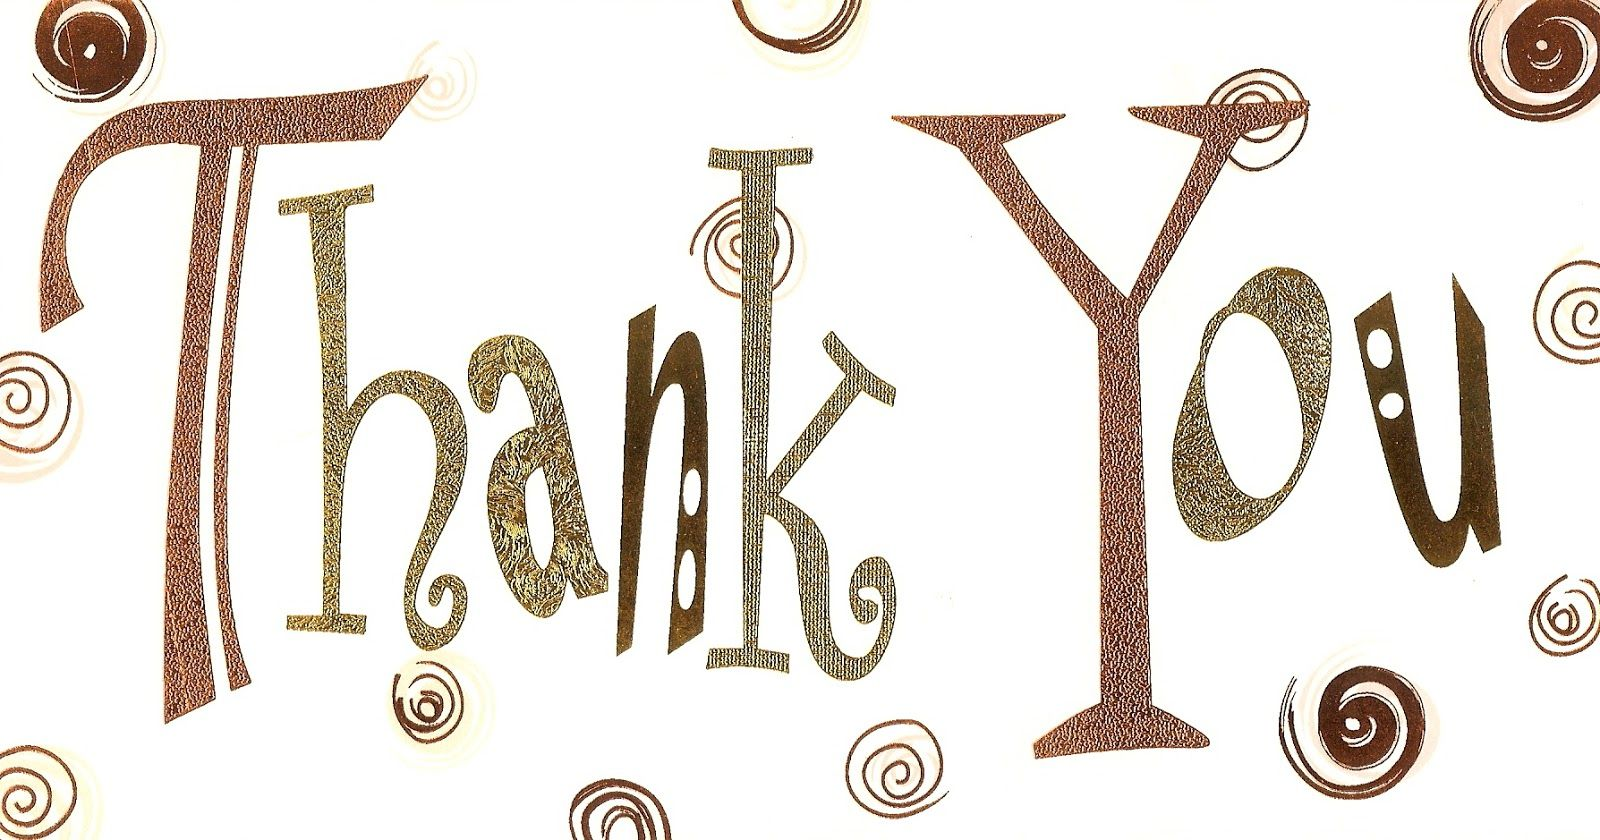 Beautiful Thank You Wallpaper Allquotes Thankyou Gratitude